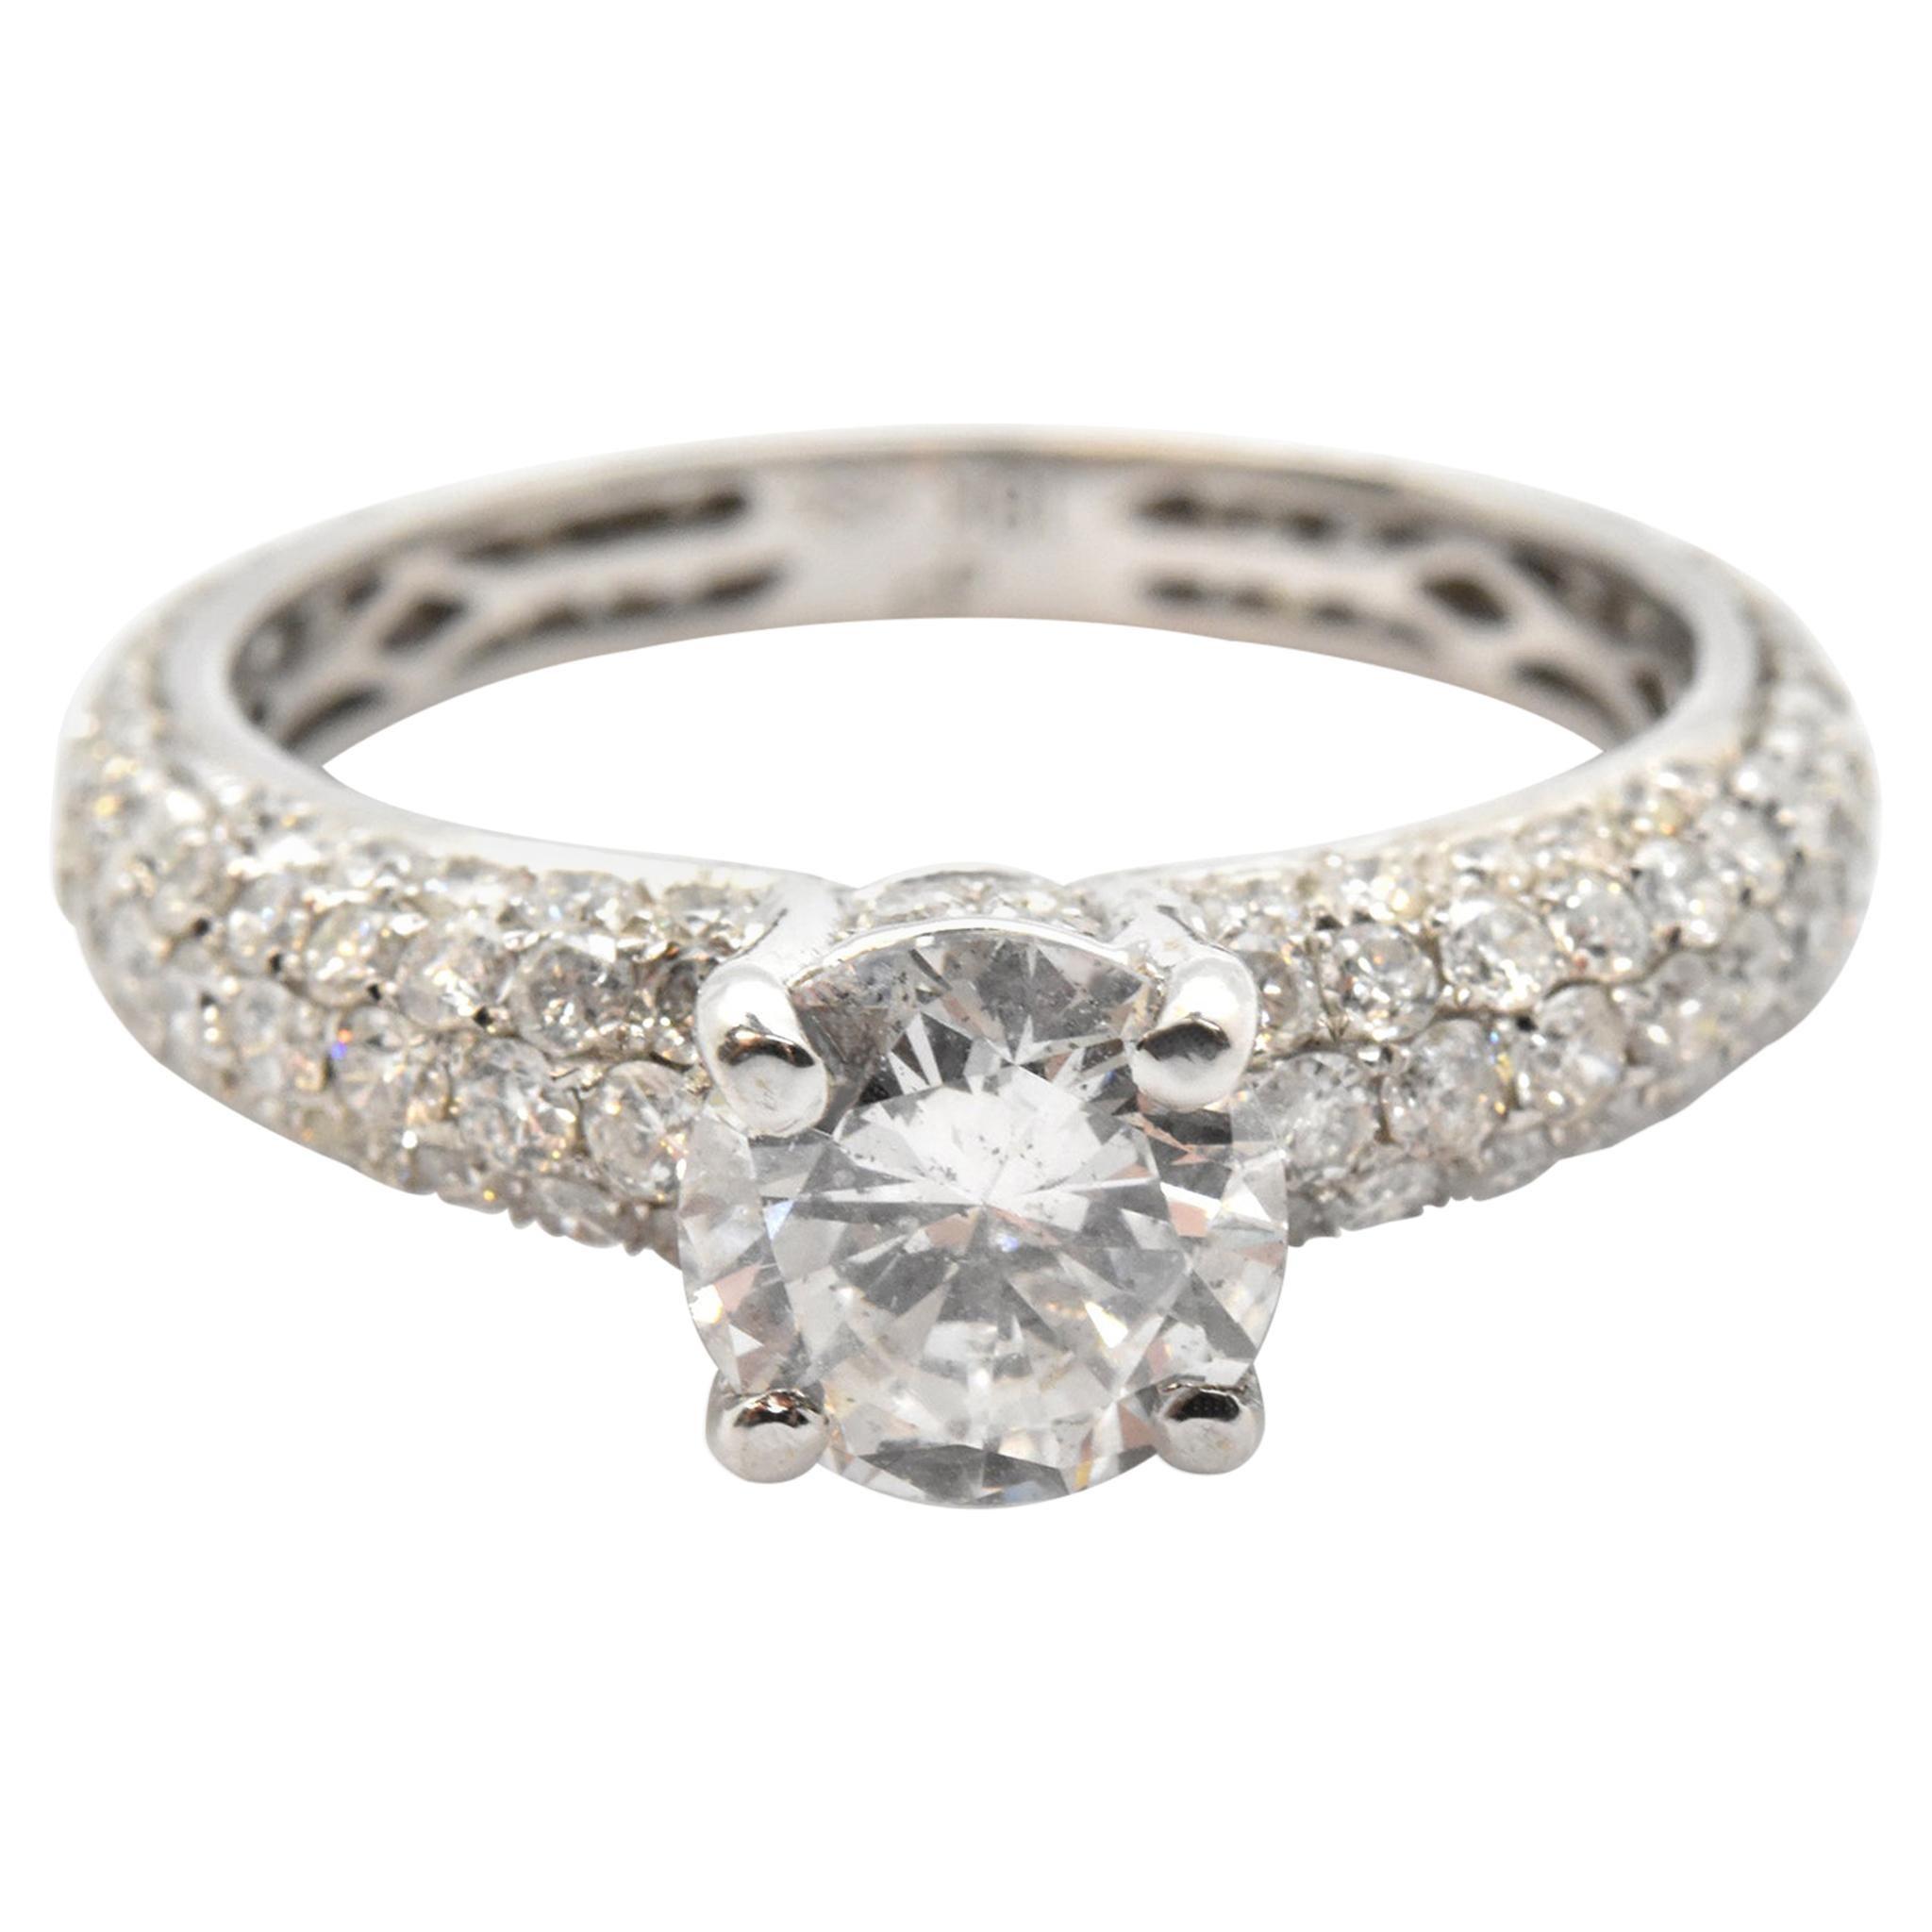 18 Karat White Gold and 1.05 Carat Round Diamond Ring with Pave Shank